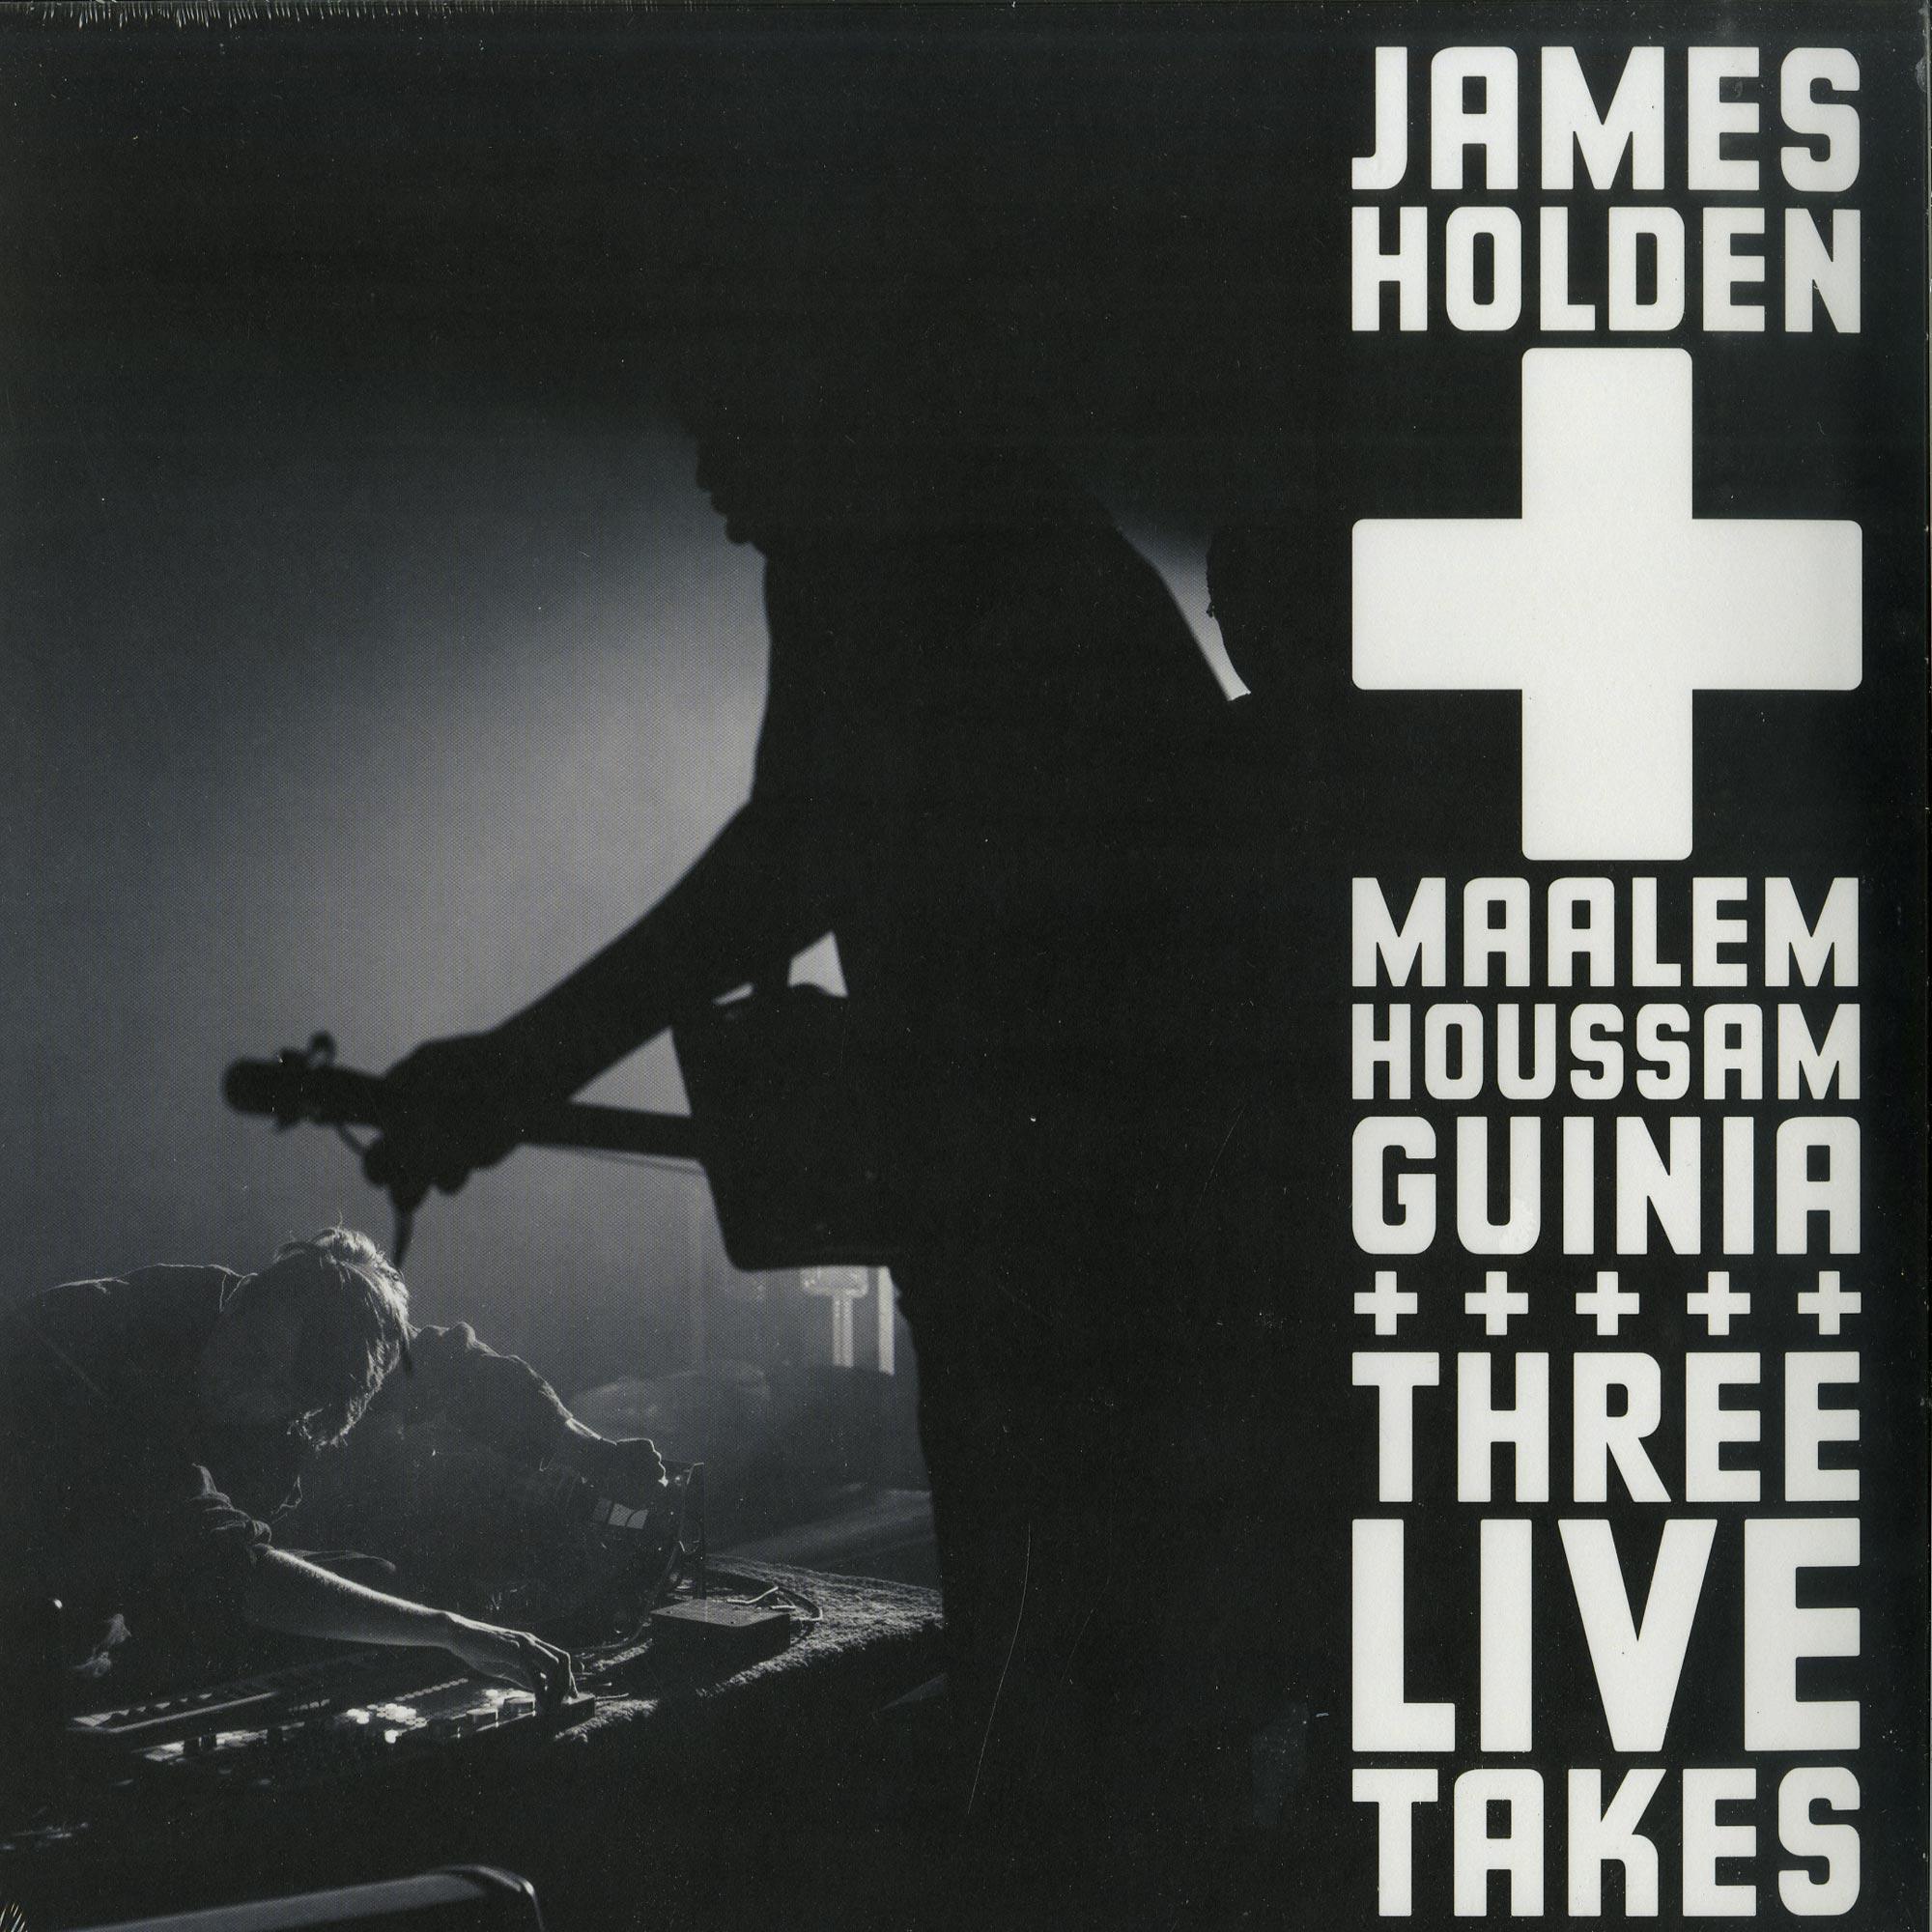 James Holden & Maalem Houssam Guinia - THREE LIVE TAKES